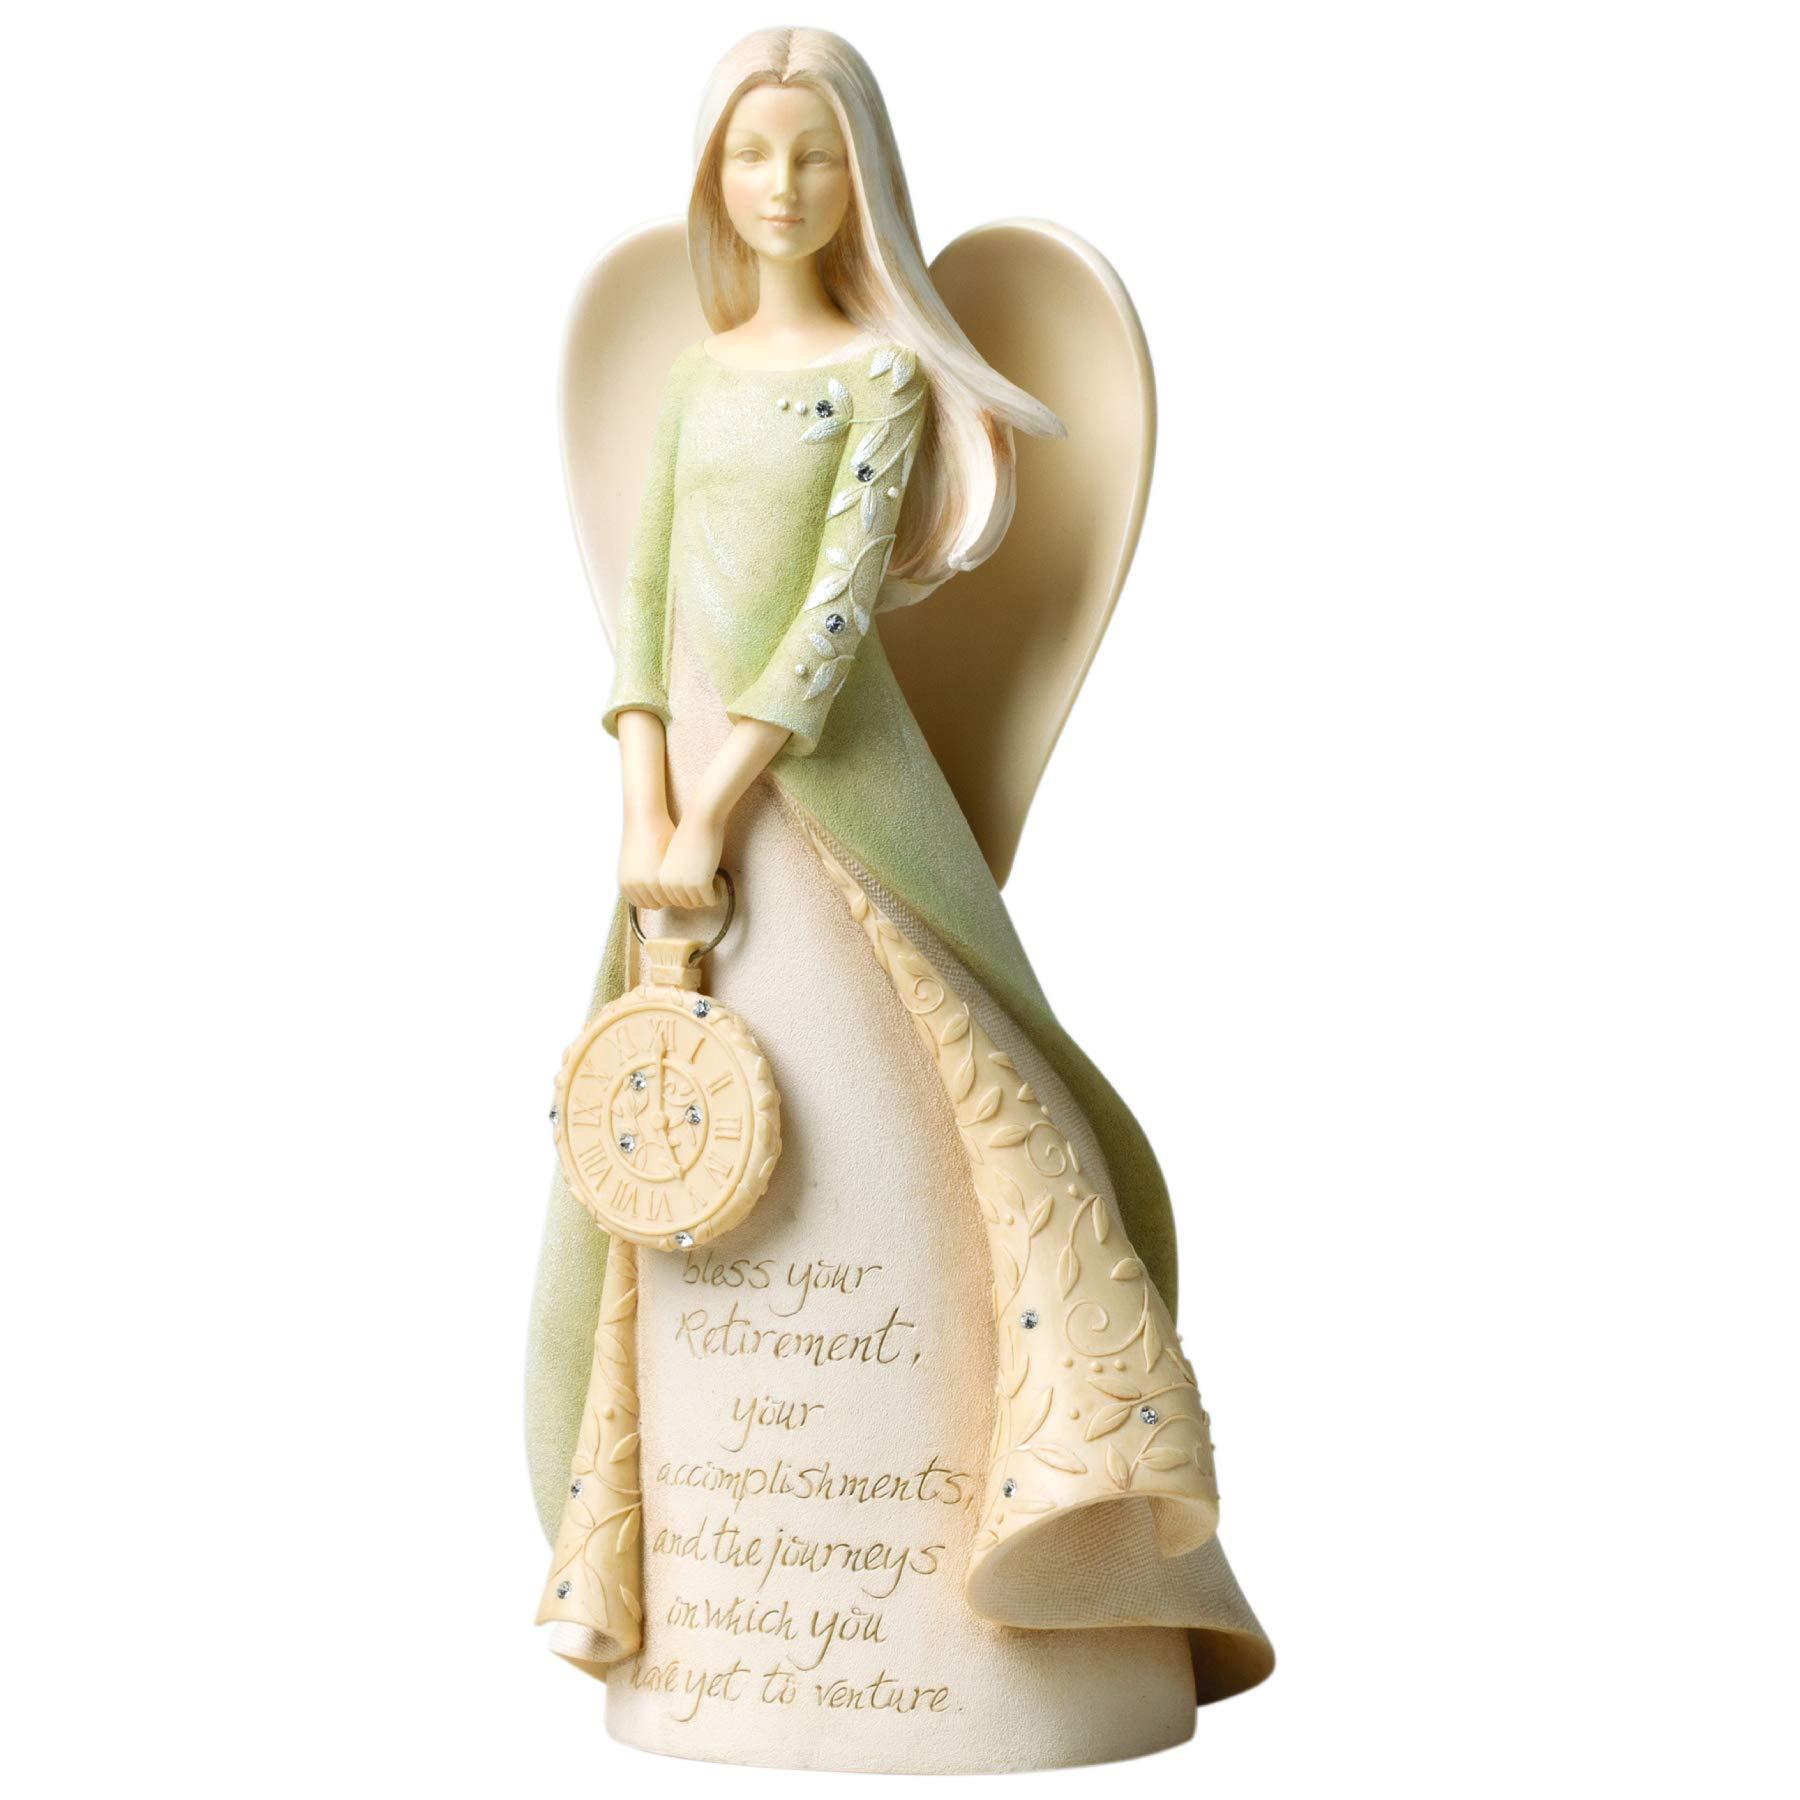 Enesco Foundations Retirement Angel Stone Resin Figurine, 9'' by Enesco